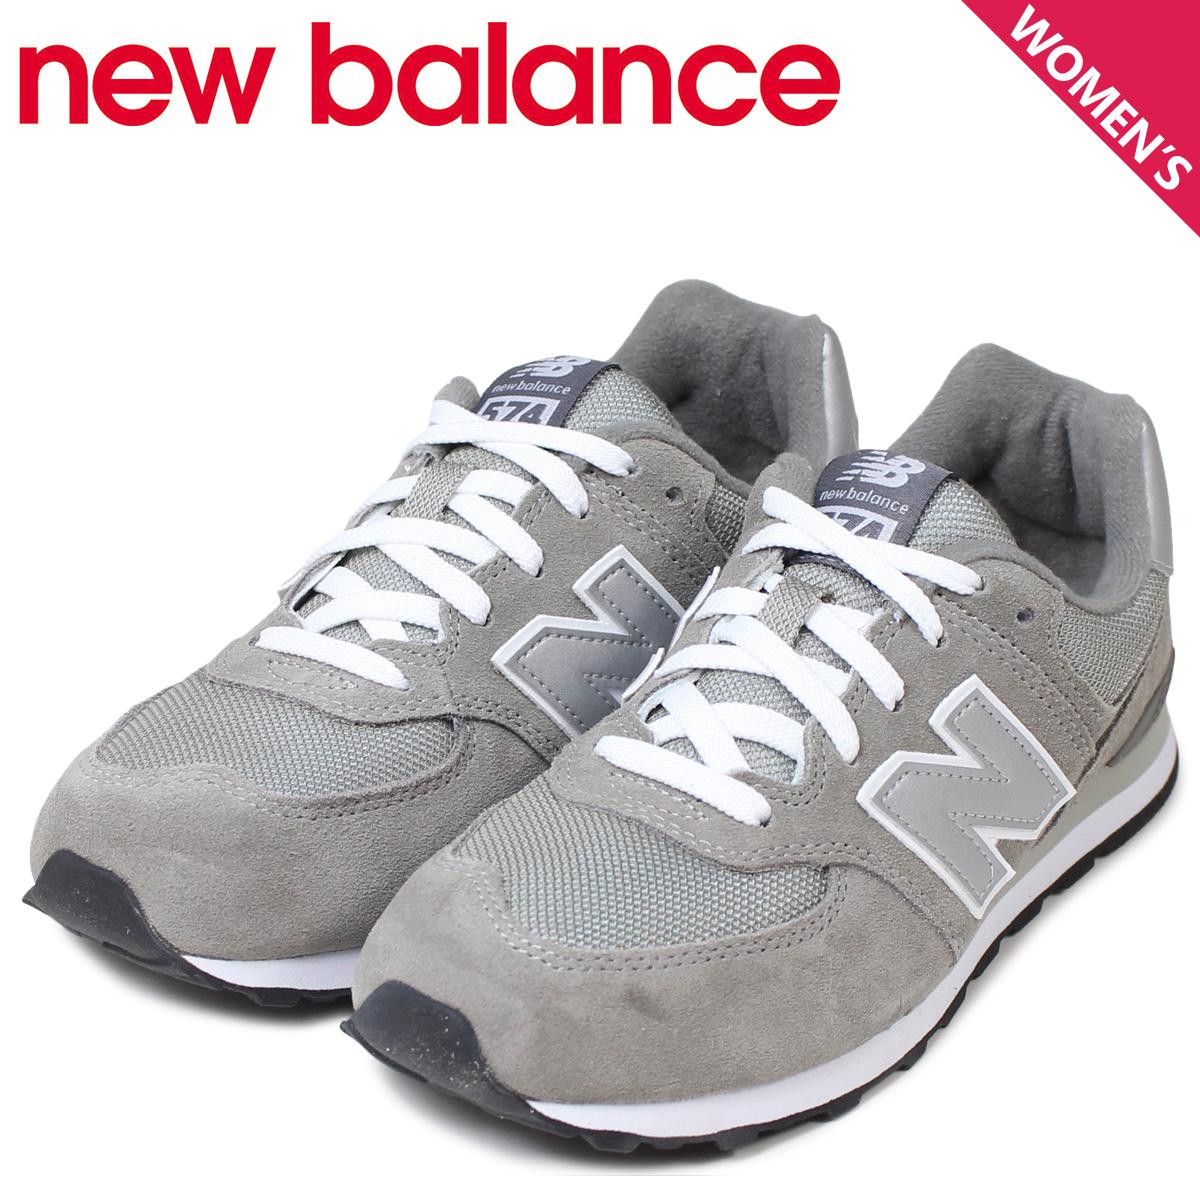 new balance kl 574